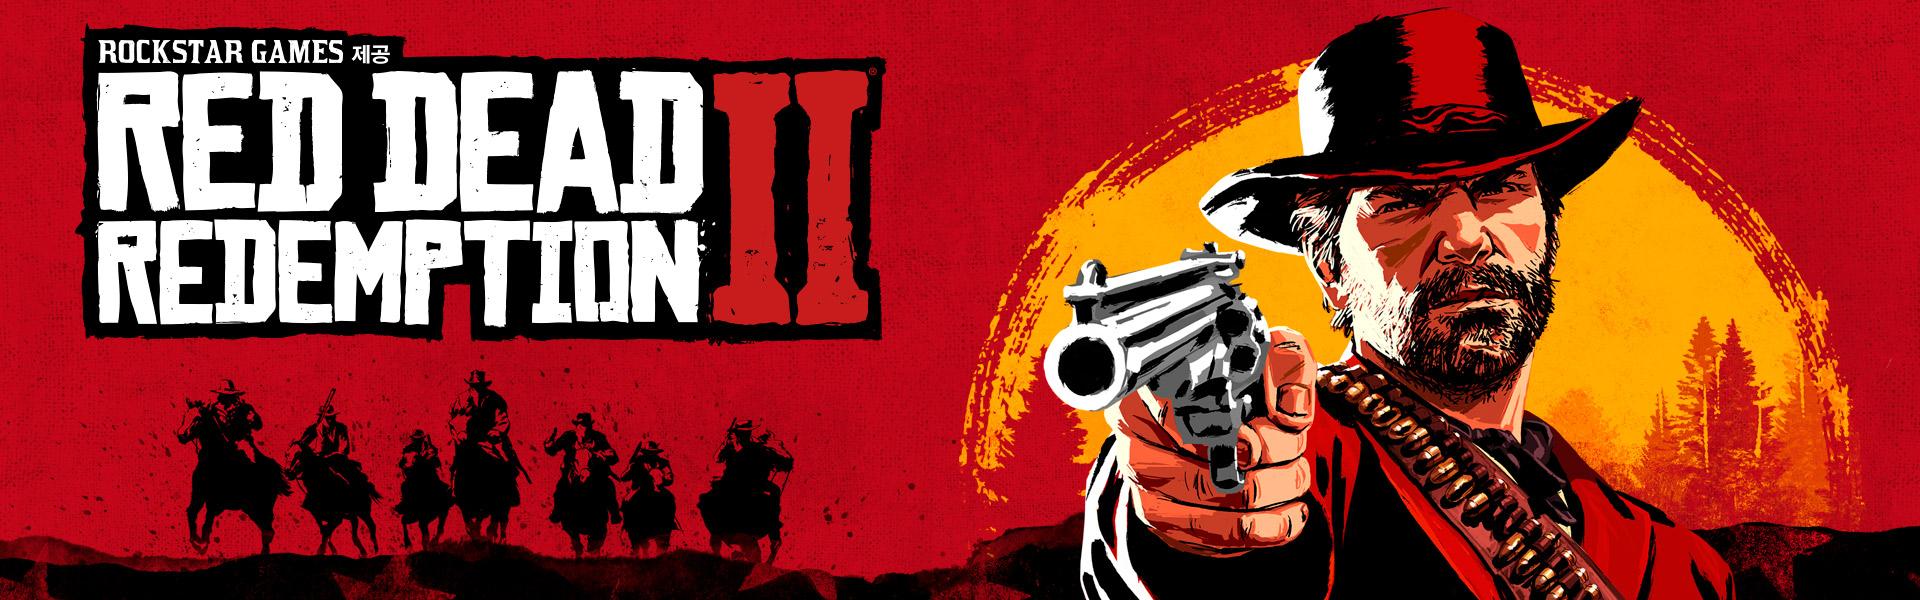 Rockstar Games 는 Red Dead Redemption 2를 선물합니다. 아서 모건의 리볼버를 가리키는 예술적 렌더링